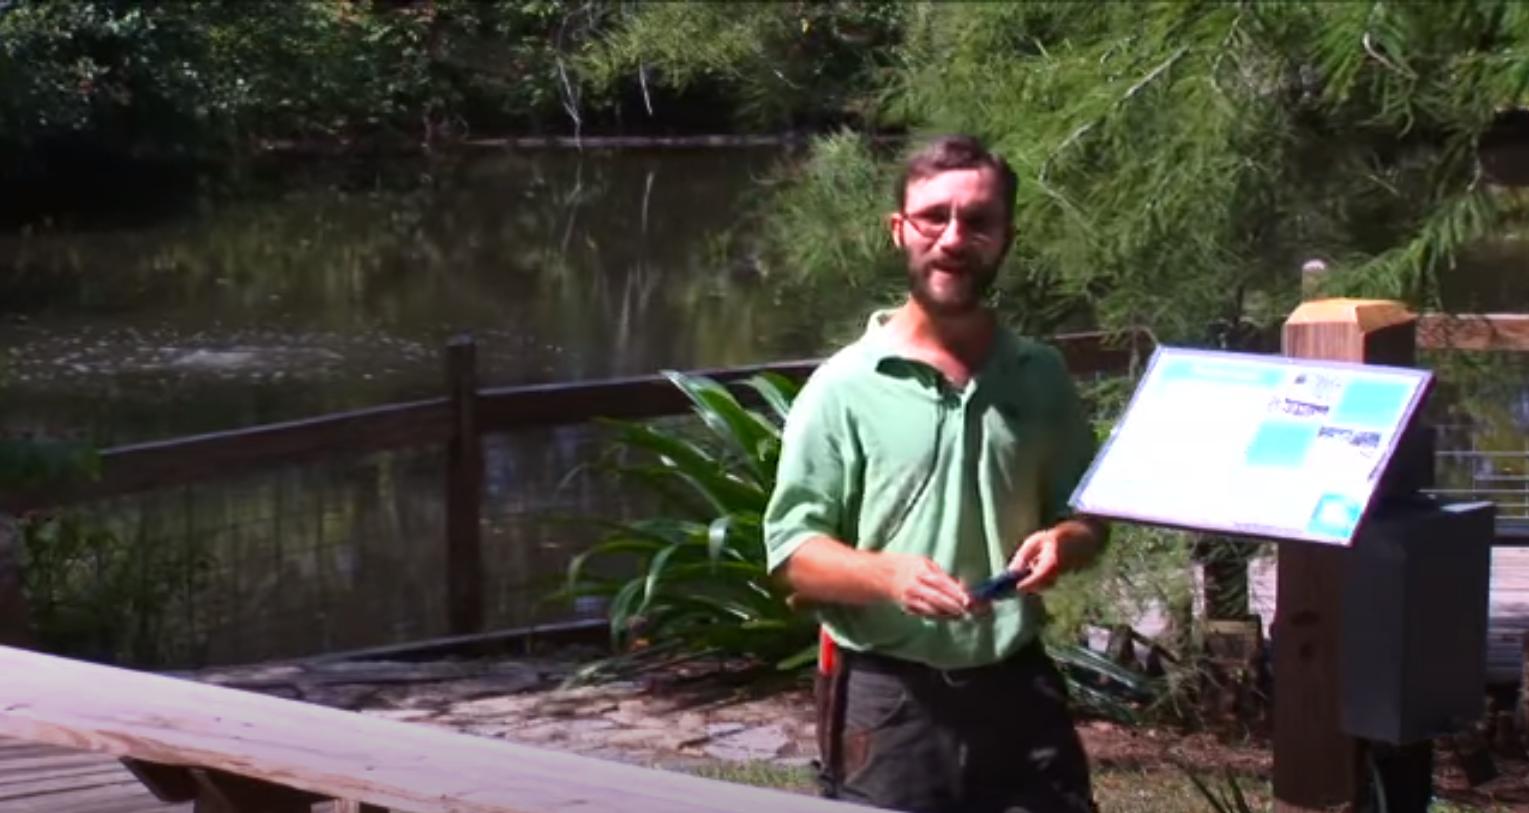 Photo of Patrick Thompson standing beside an interpretative sign at the Arboretum.